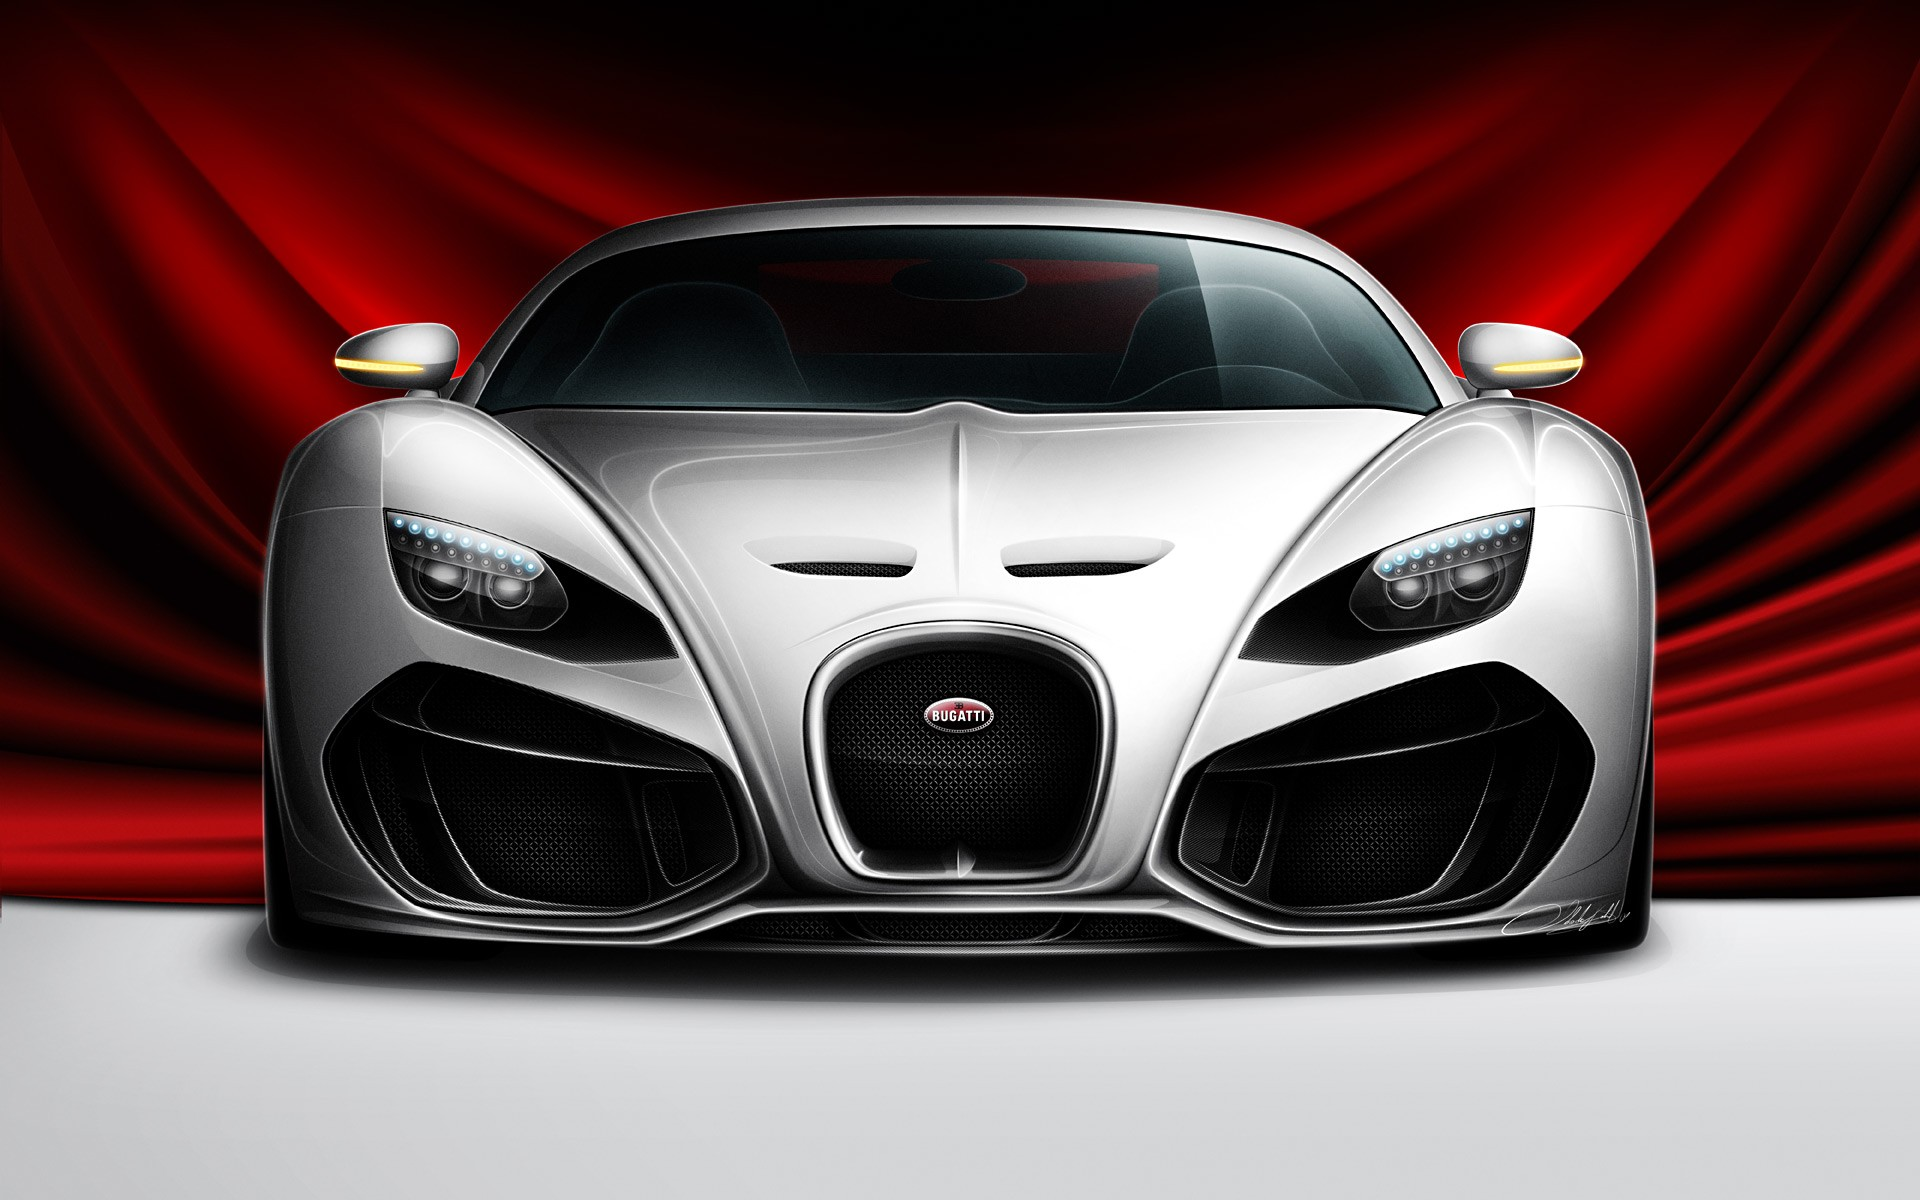 White Bugatti Veyron, car, wallpaper, скачать фото обои на рабочий стол